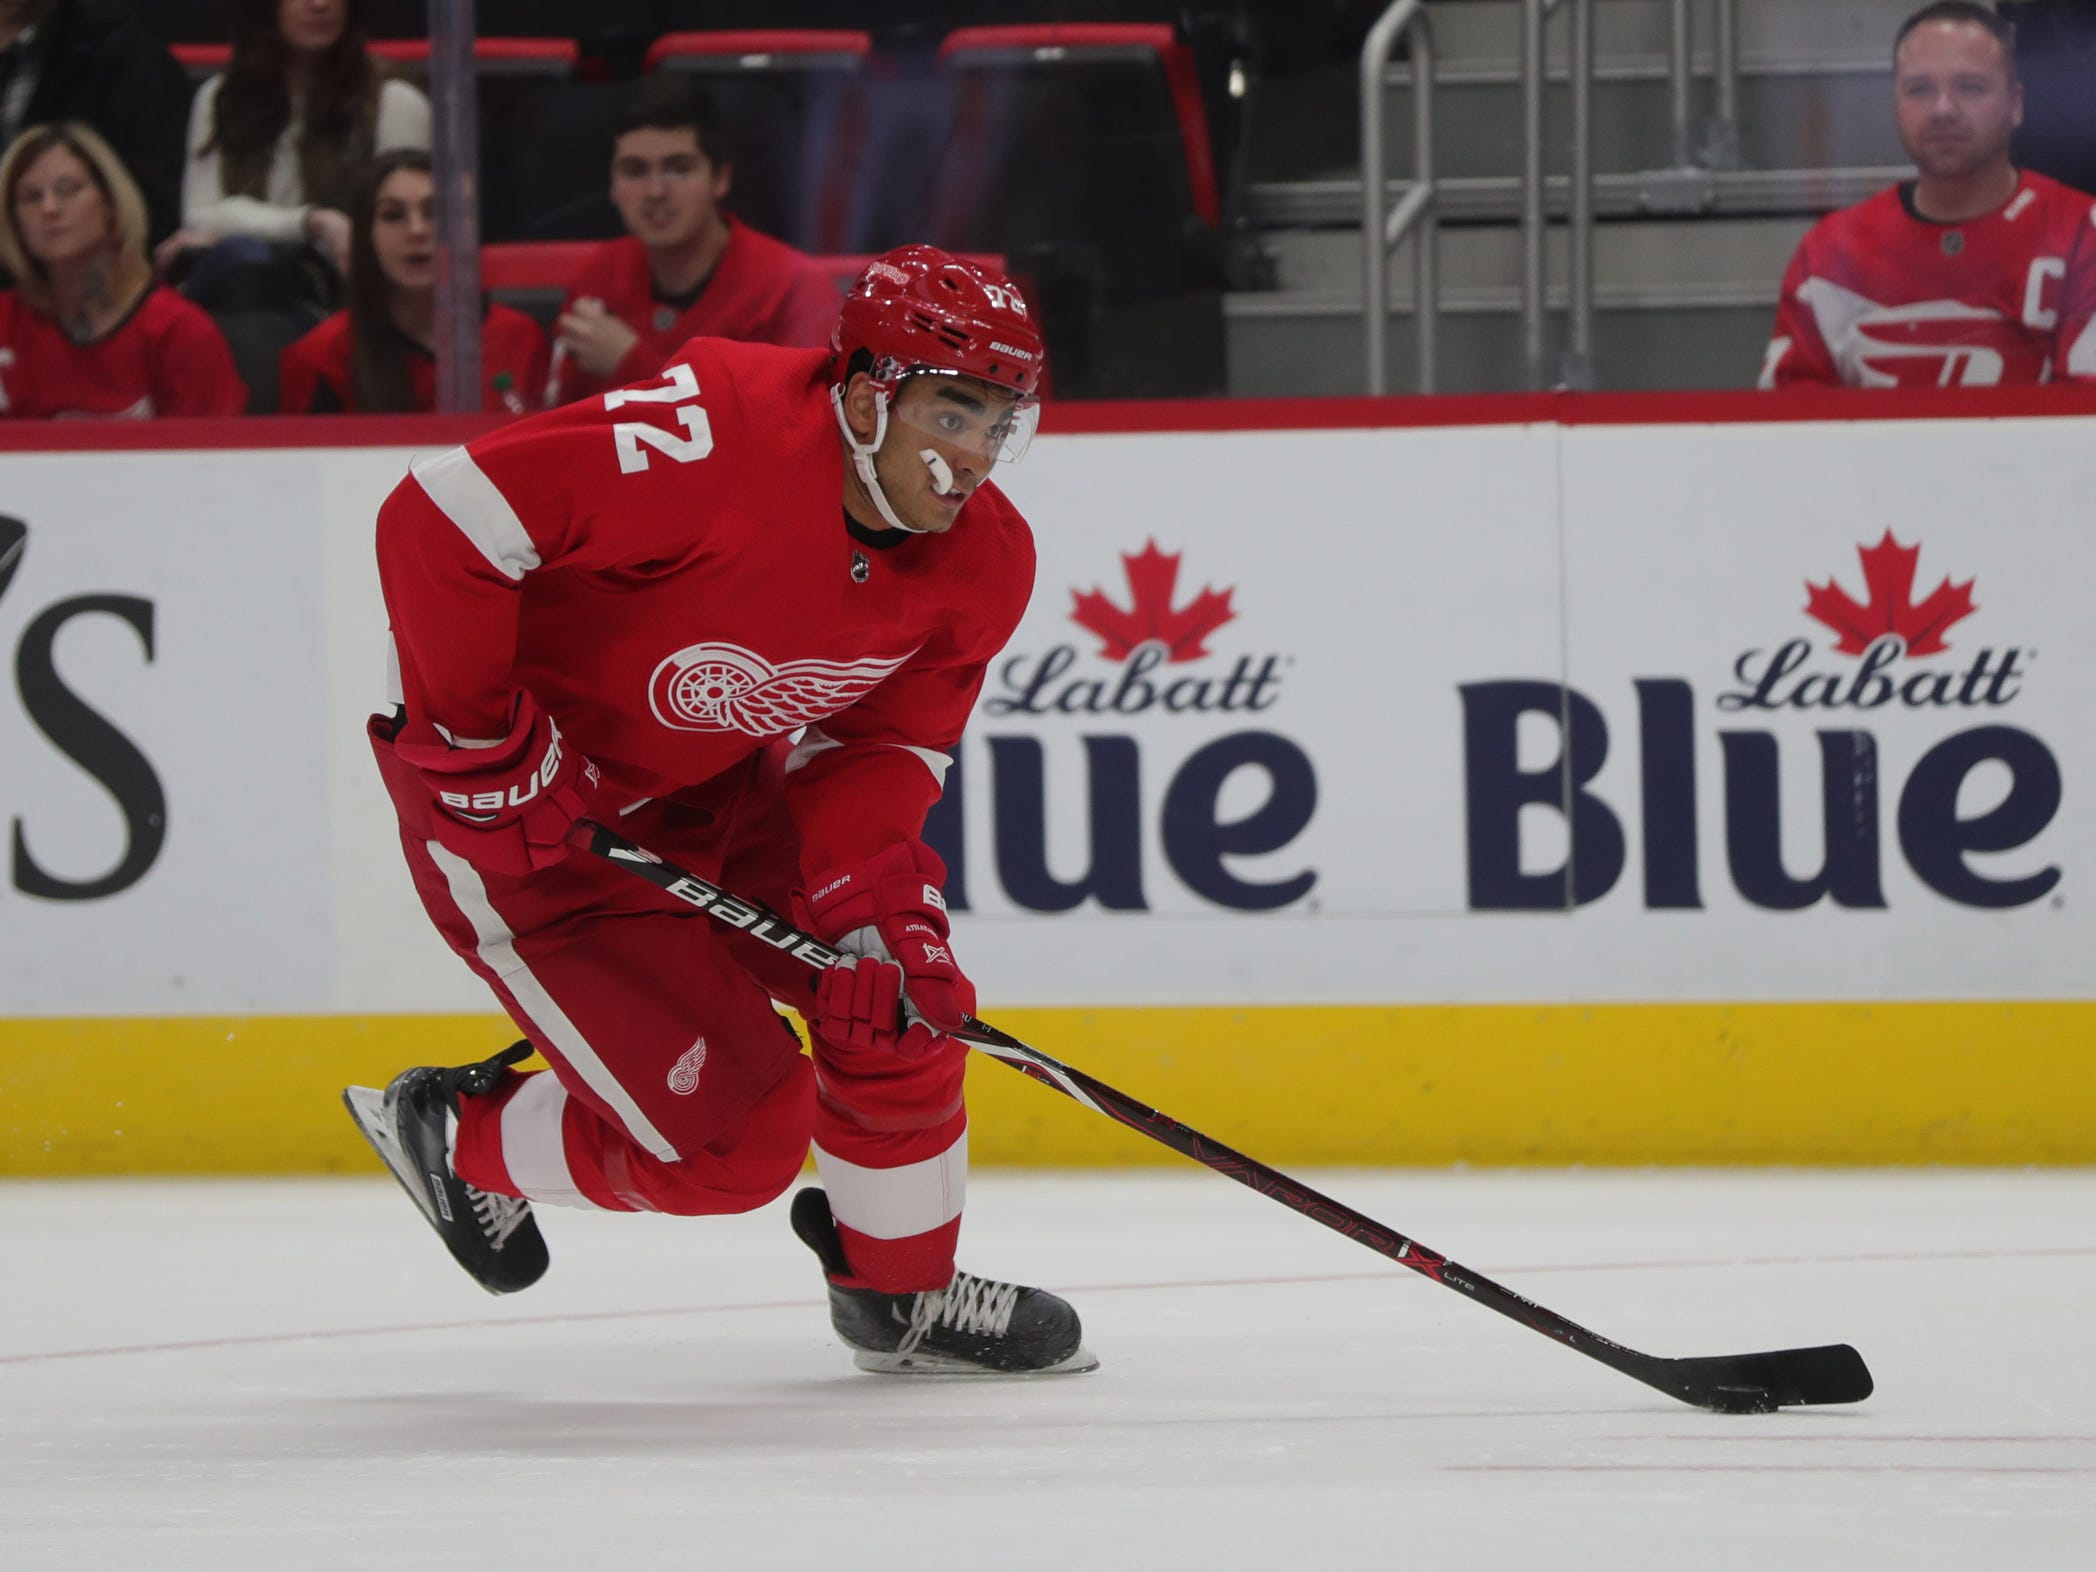 Detroit Red Wings forward Andreas Athanasiou skates against the Ottawa Senators on Thursday, Feb. 14, 2019, at Little Caesars Arena in Detroit.